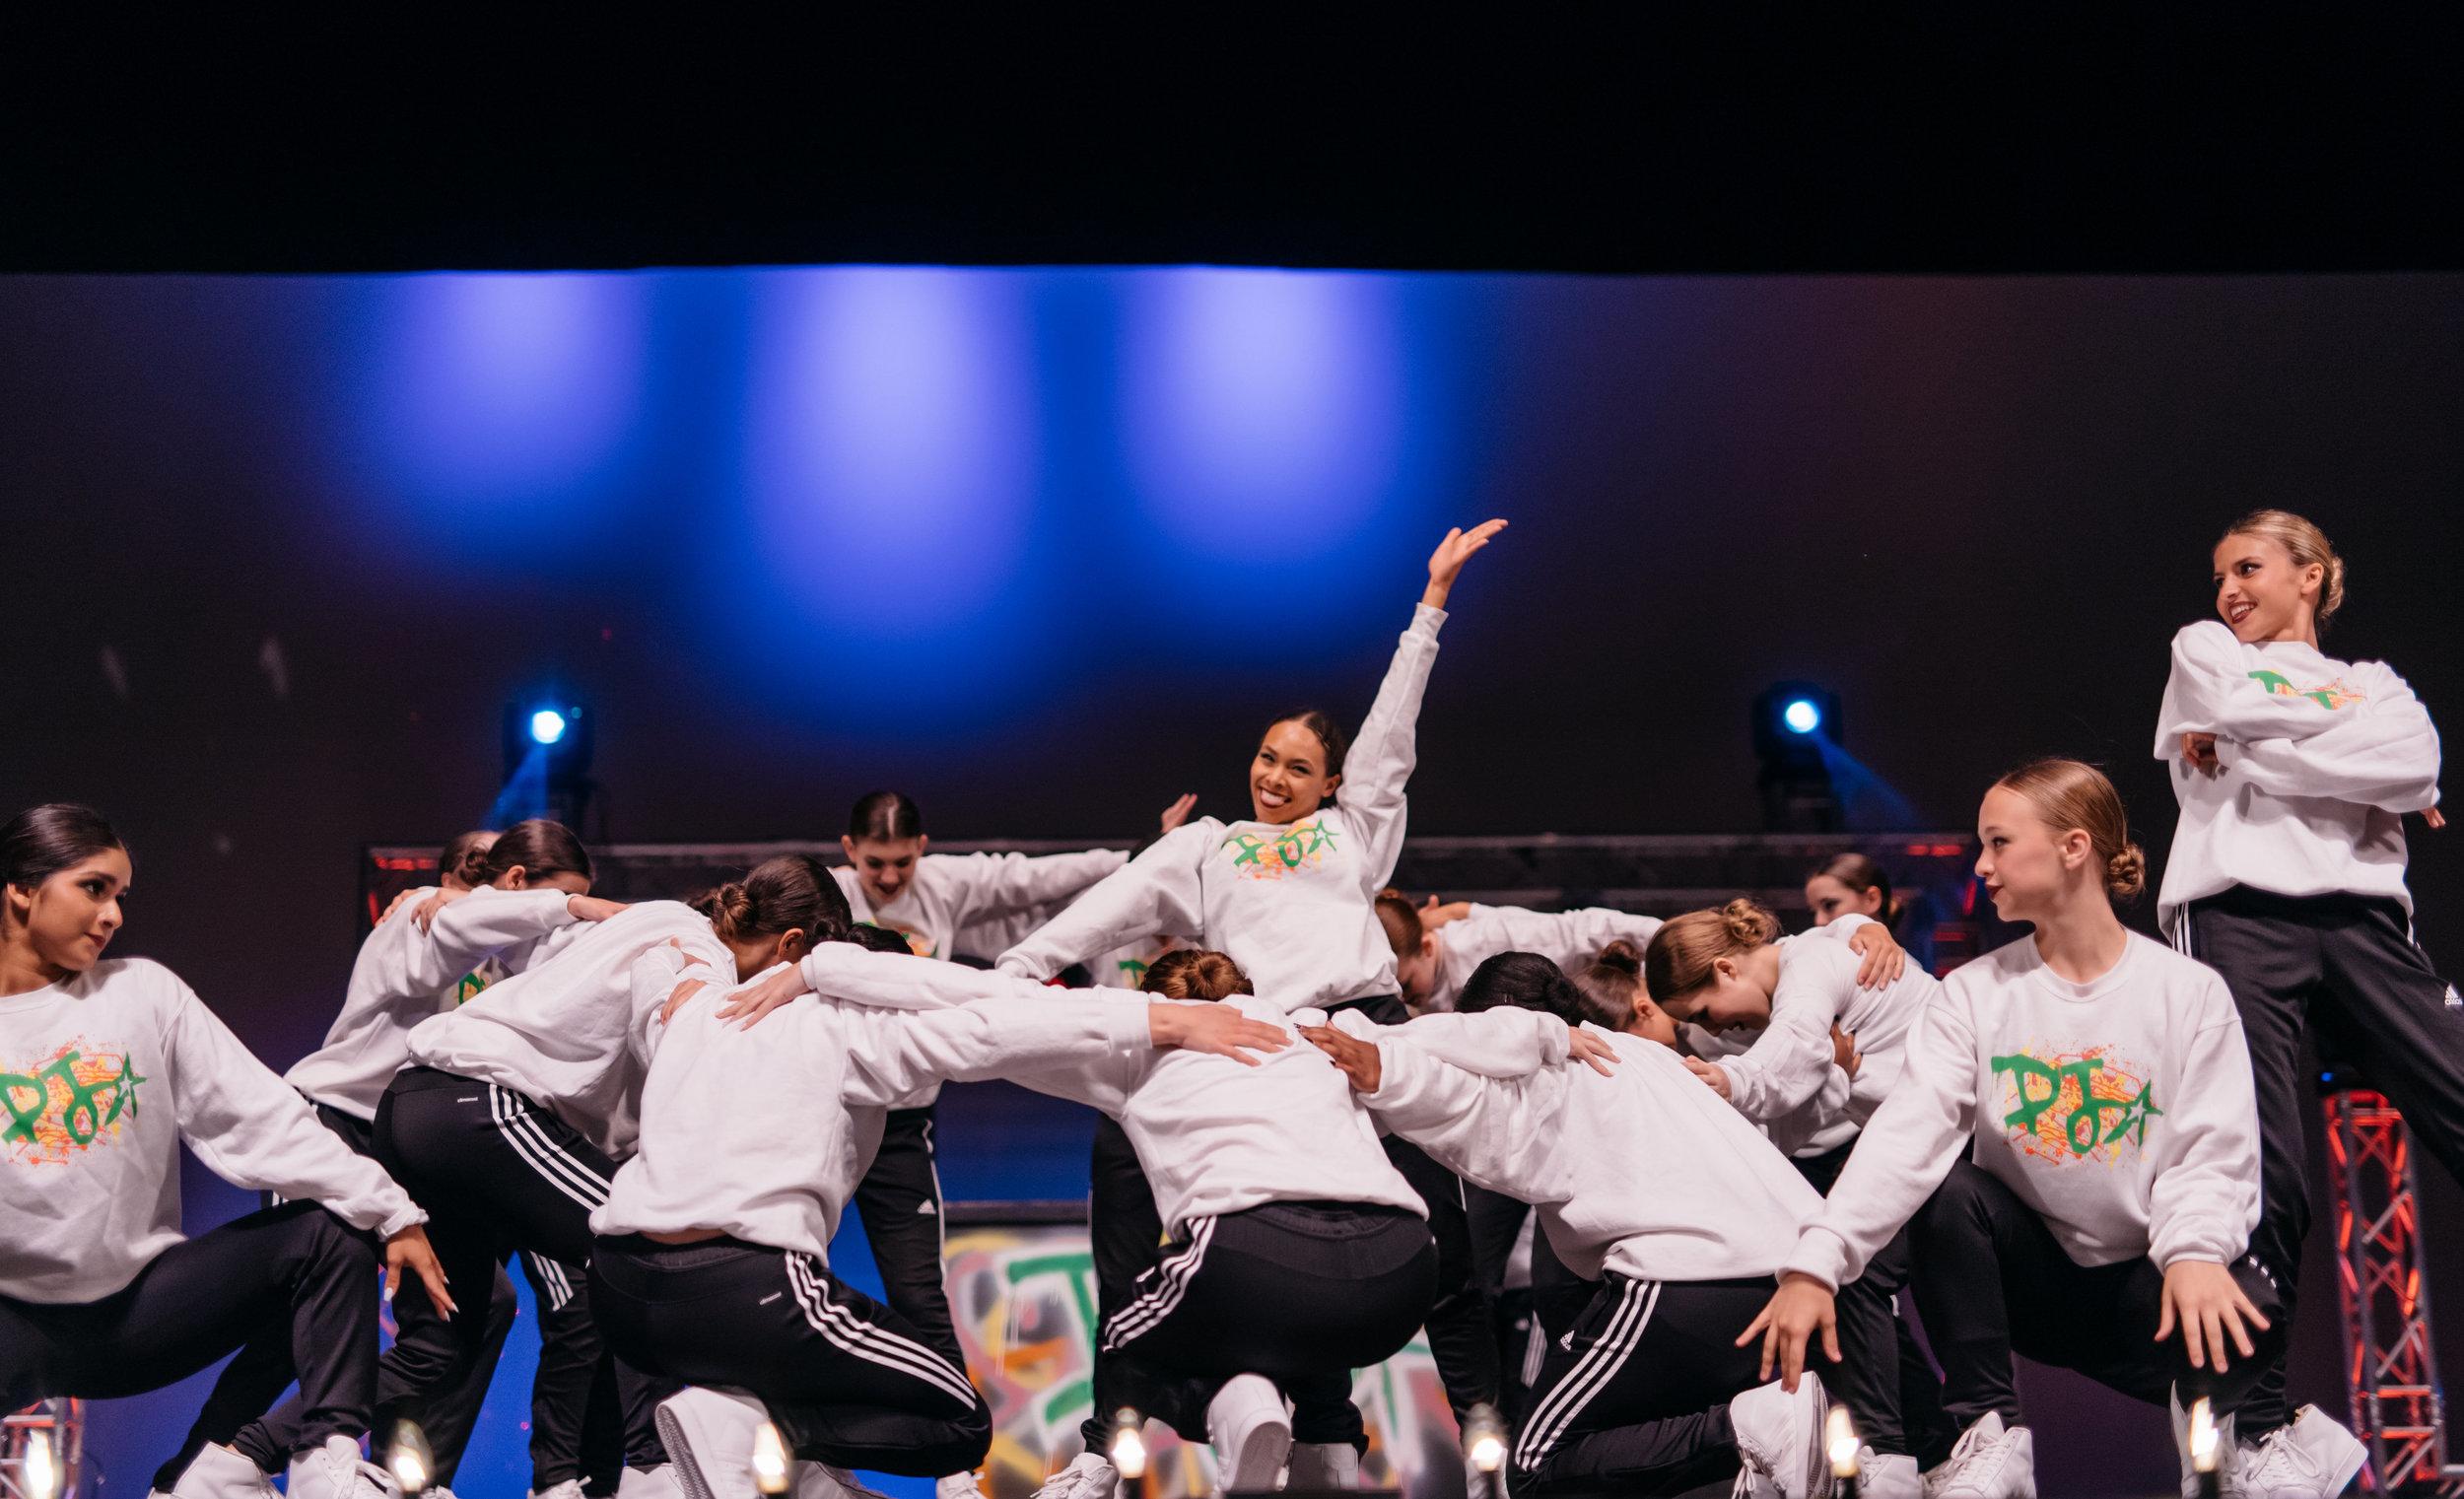 Steps N Concert Steps N Motion Dance Recital 2018-Saturday Show 2-0123.jpg